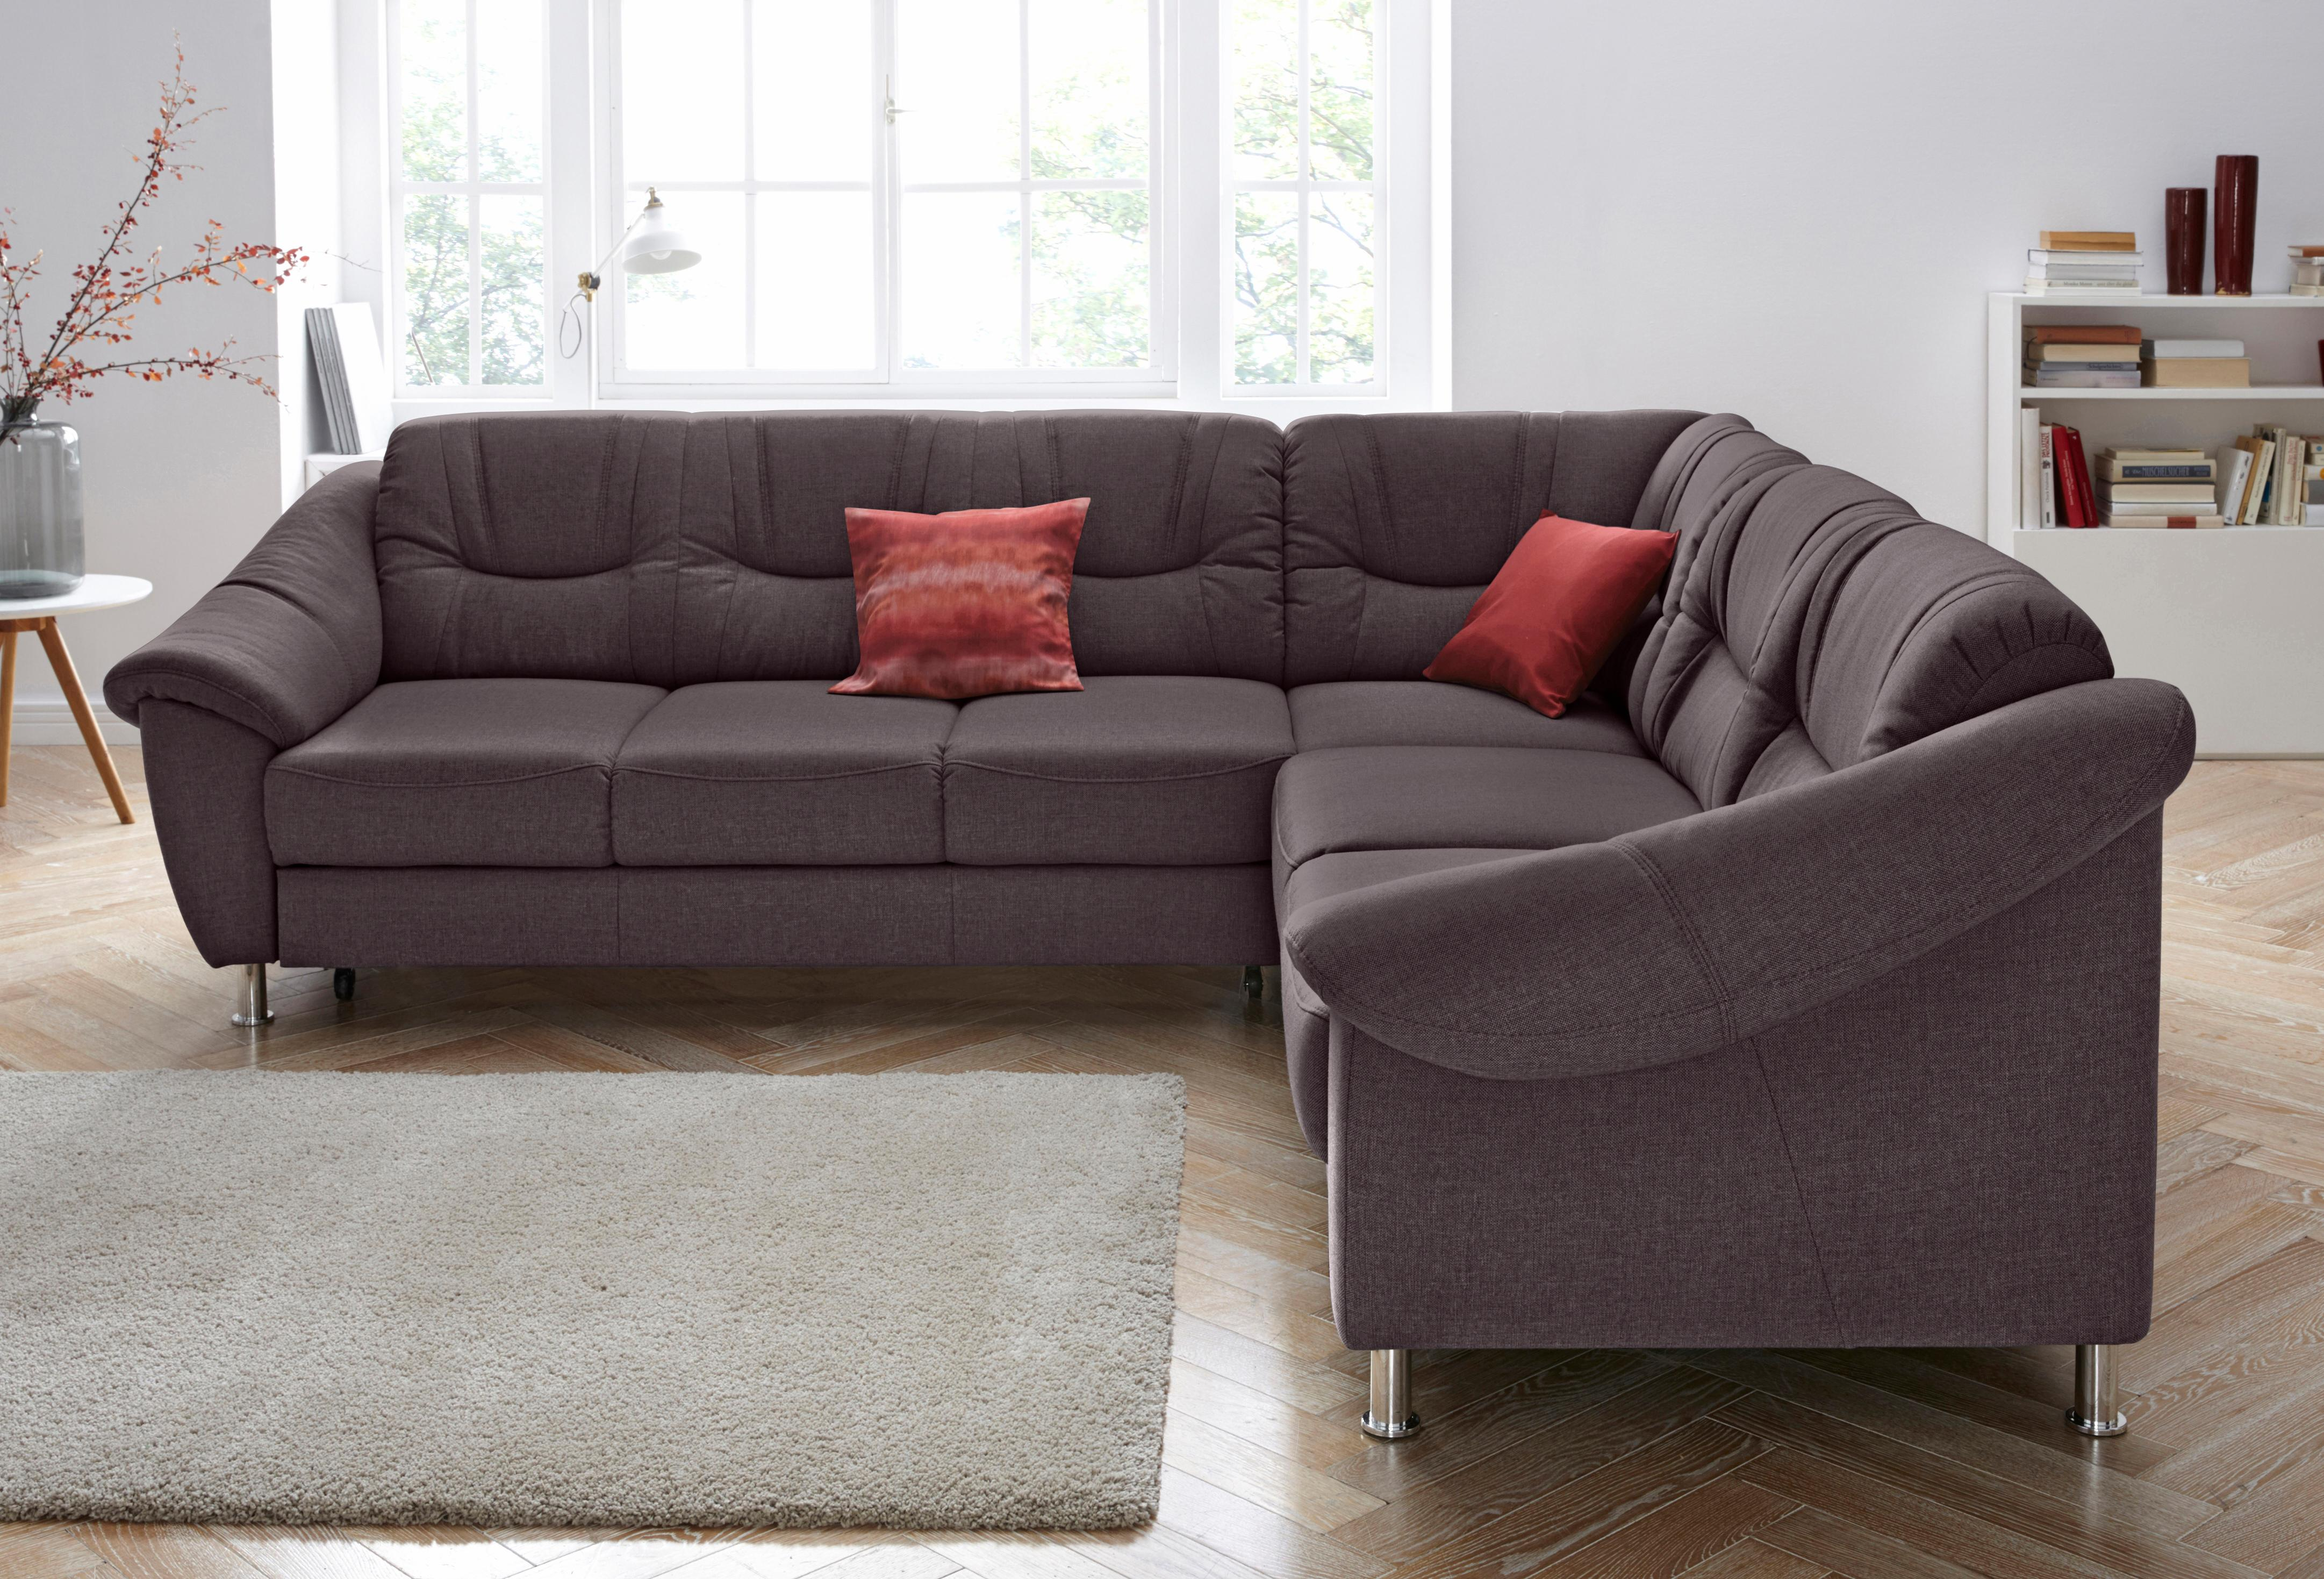 sit more polsterecke mit federkern wahlweise mit bettfunktion moebel suchmaschine. Black Bedroom Furniture Sets. Home Design Ideas